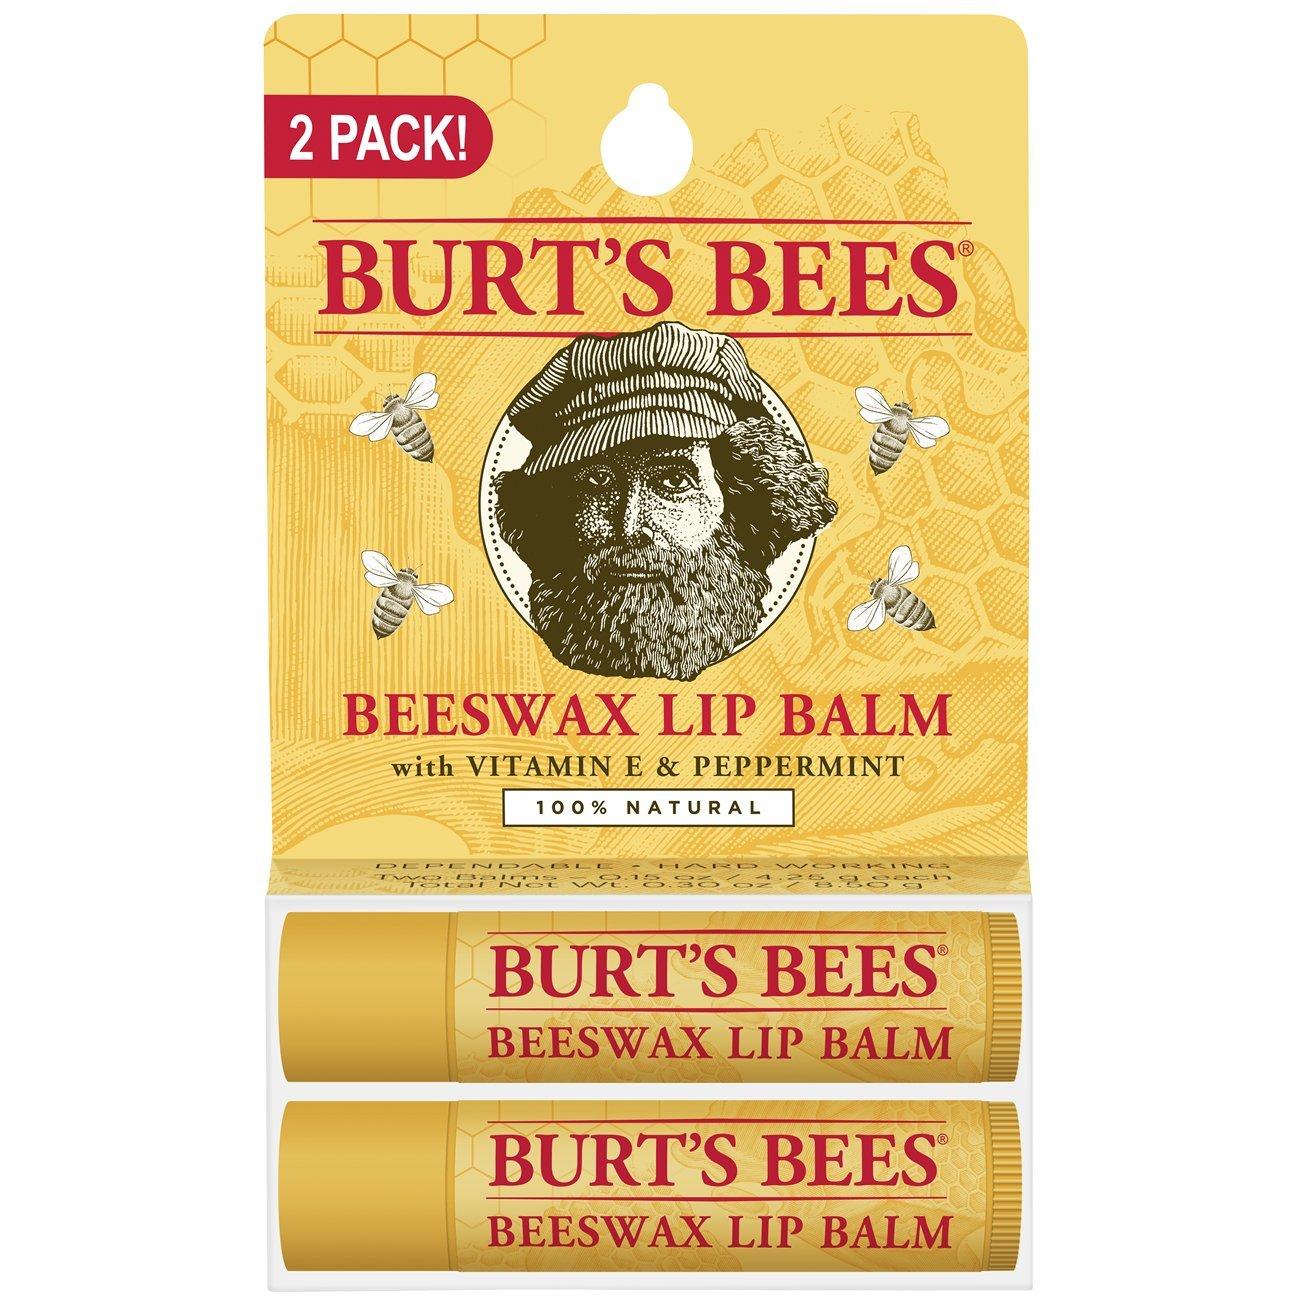 Burt's Bees 100% Natural Moisturizing Lip Balm Beeswax